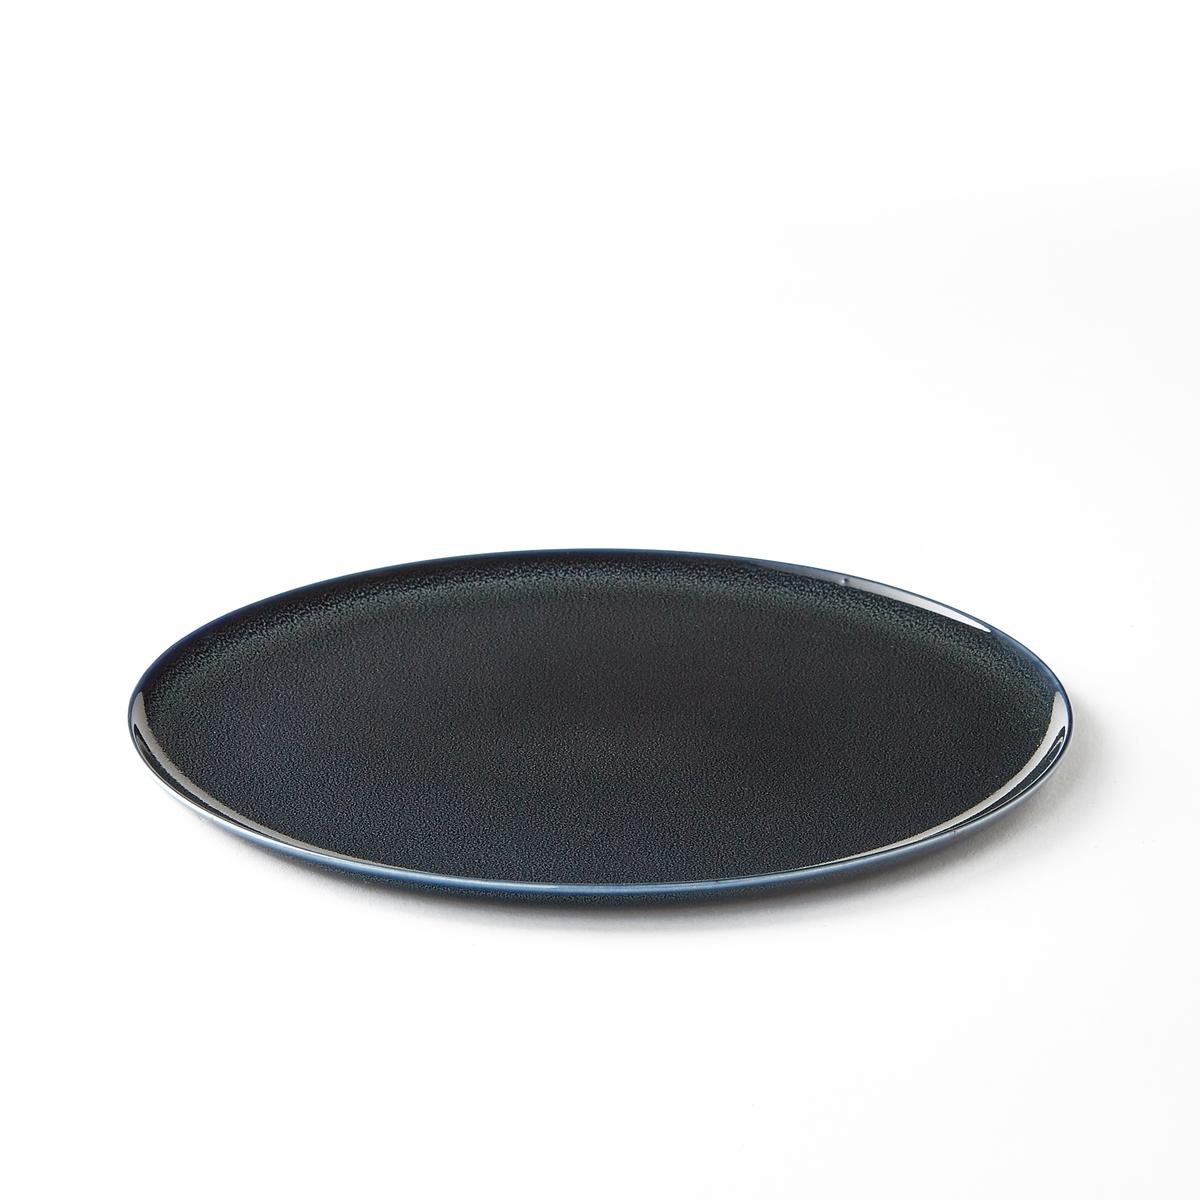 Тарелка мелкая из керамики, диаметр 26 см, Banoka тарелка глубокая из керамики диаметр 21 см banoka